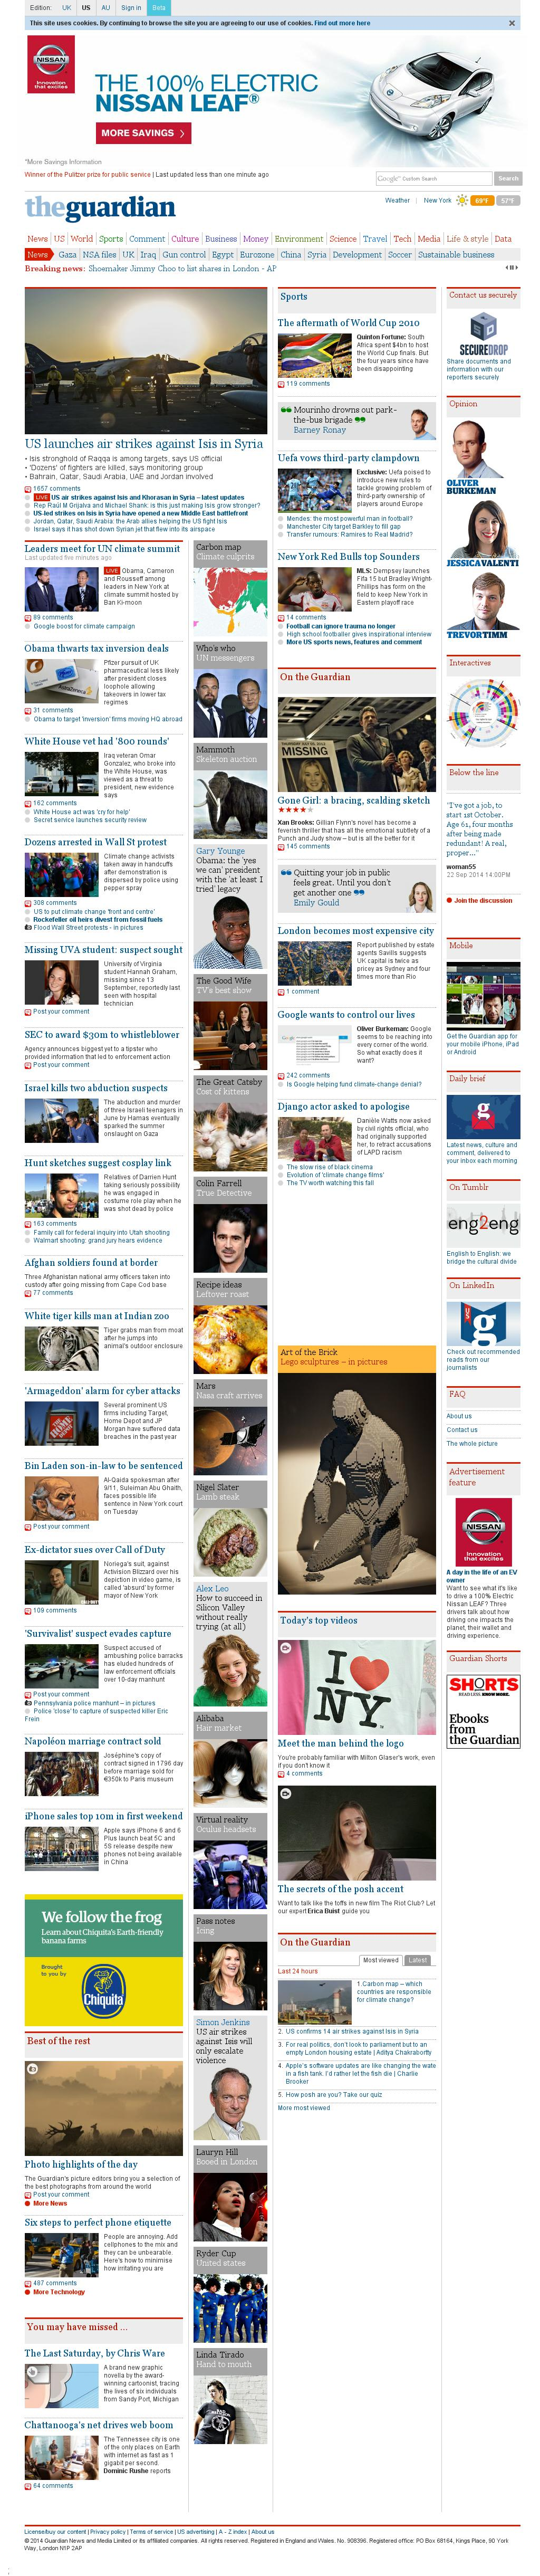 The Guardian at Tuesday Sept. 23, 2014, 1:07 p.m. UTC